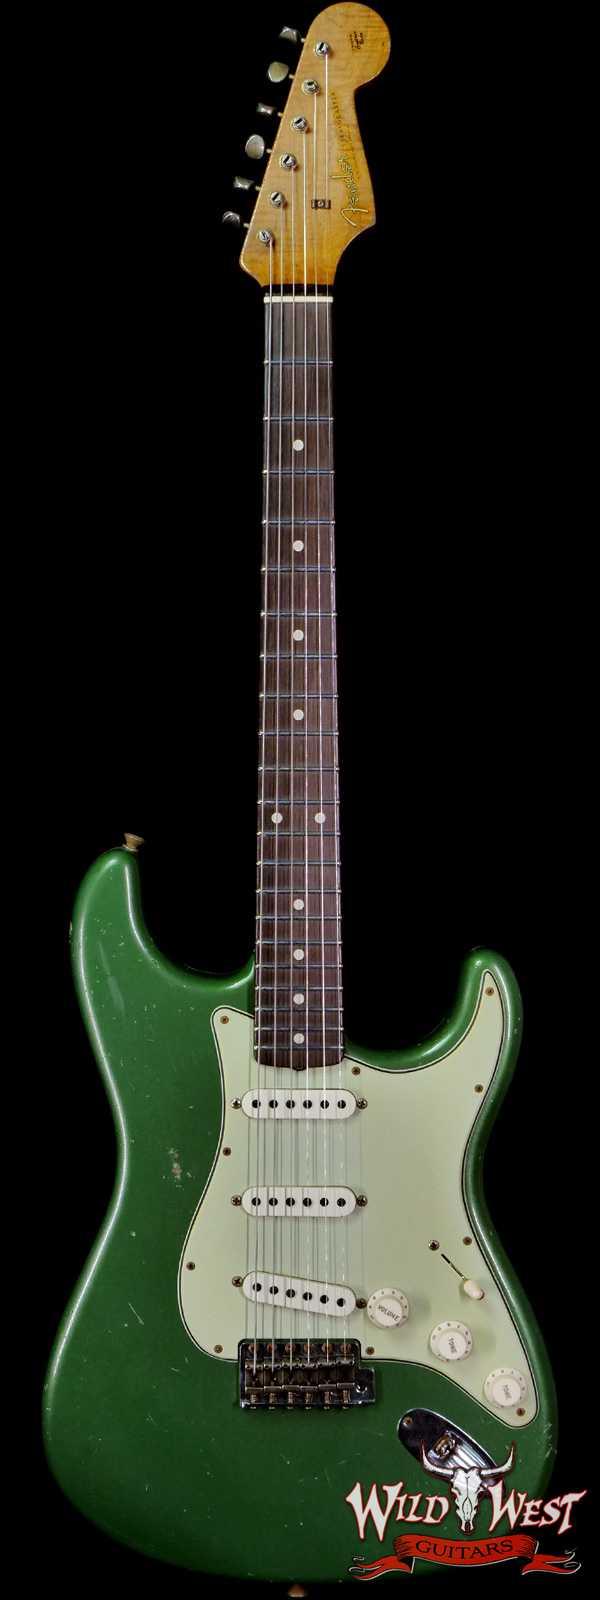 Fender Custom Shop Dennis Galuszka Masterbuilt Roasted 1959 Stratocaster Brazilian Rosewood Slab Board Hand-Wound PUs Journeyman Relic Aged Sage Green Metallic